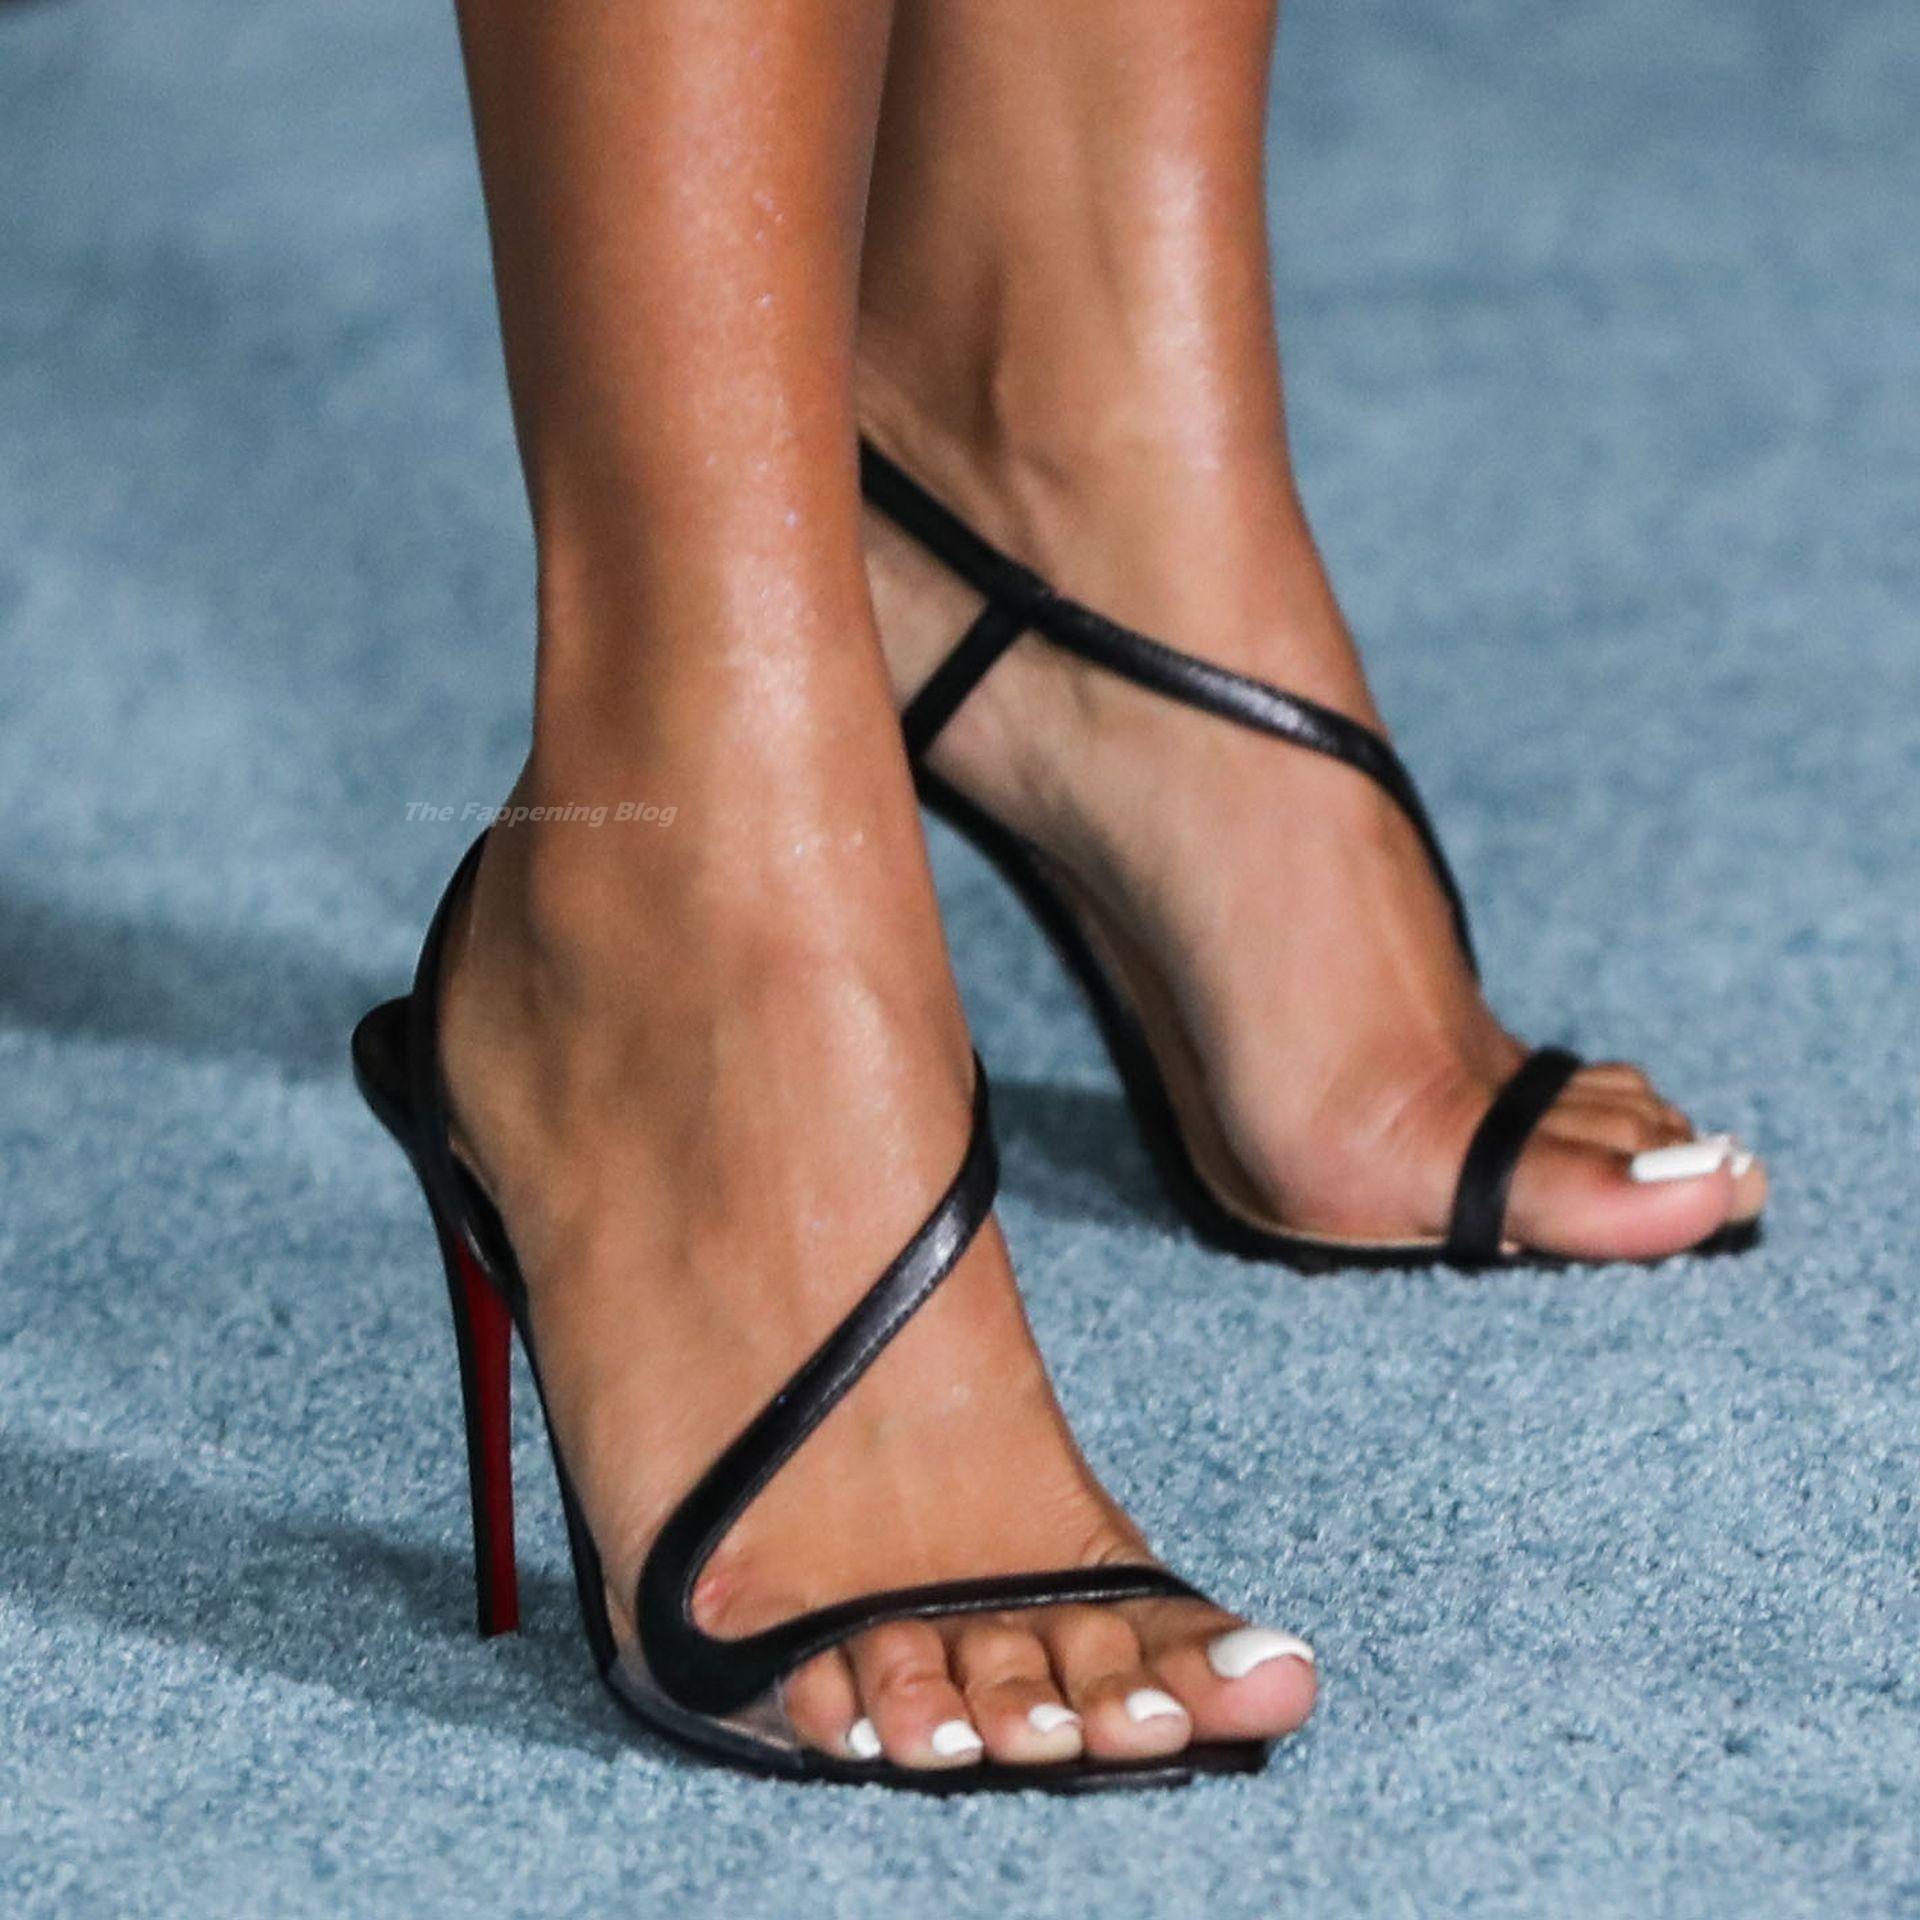 Karrueche-Tran-Sexy-Legs-Feet-The-Fappening-Blog-21.jpg